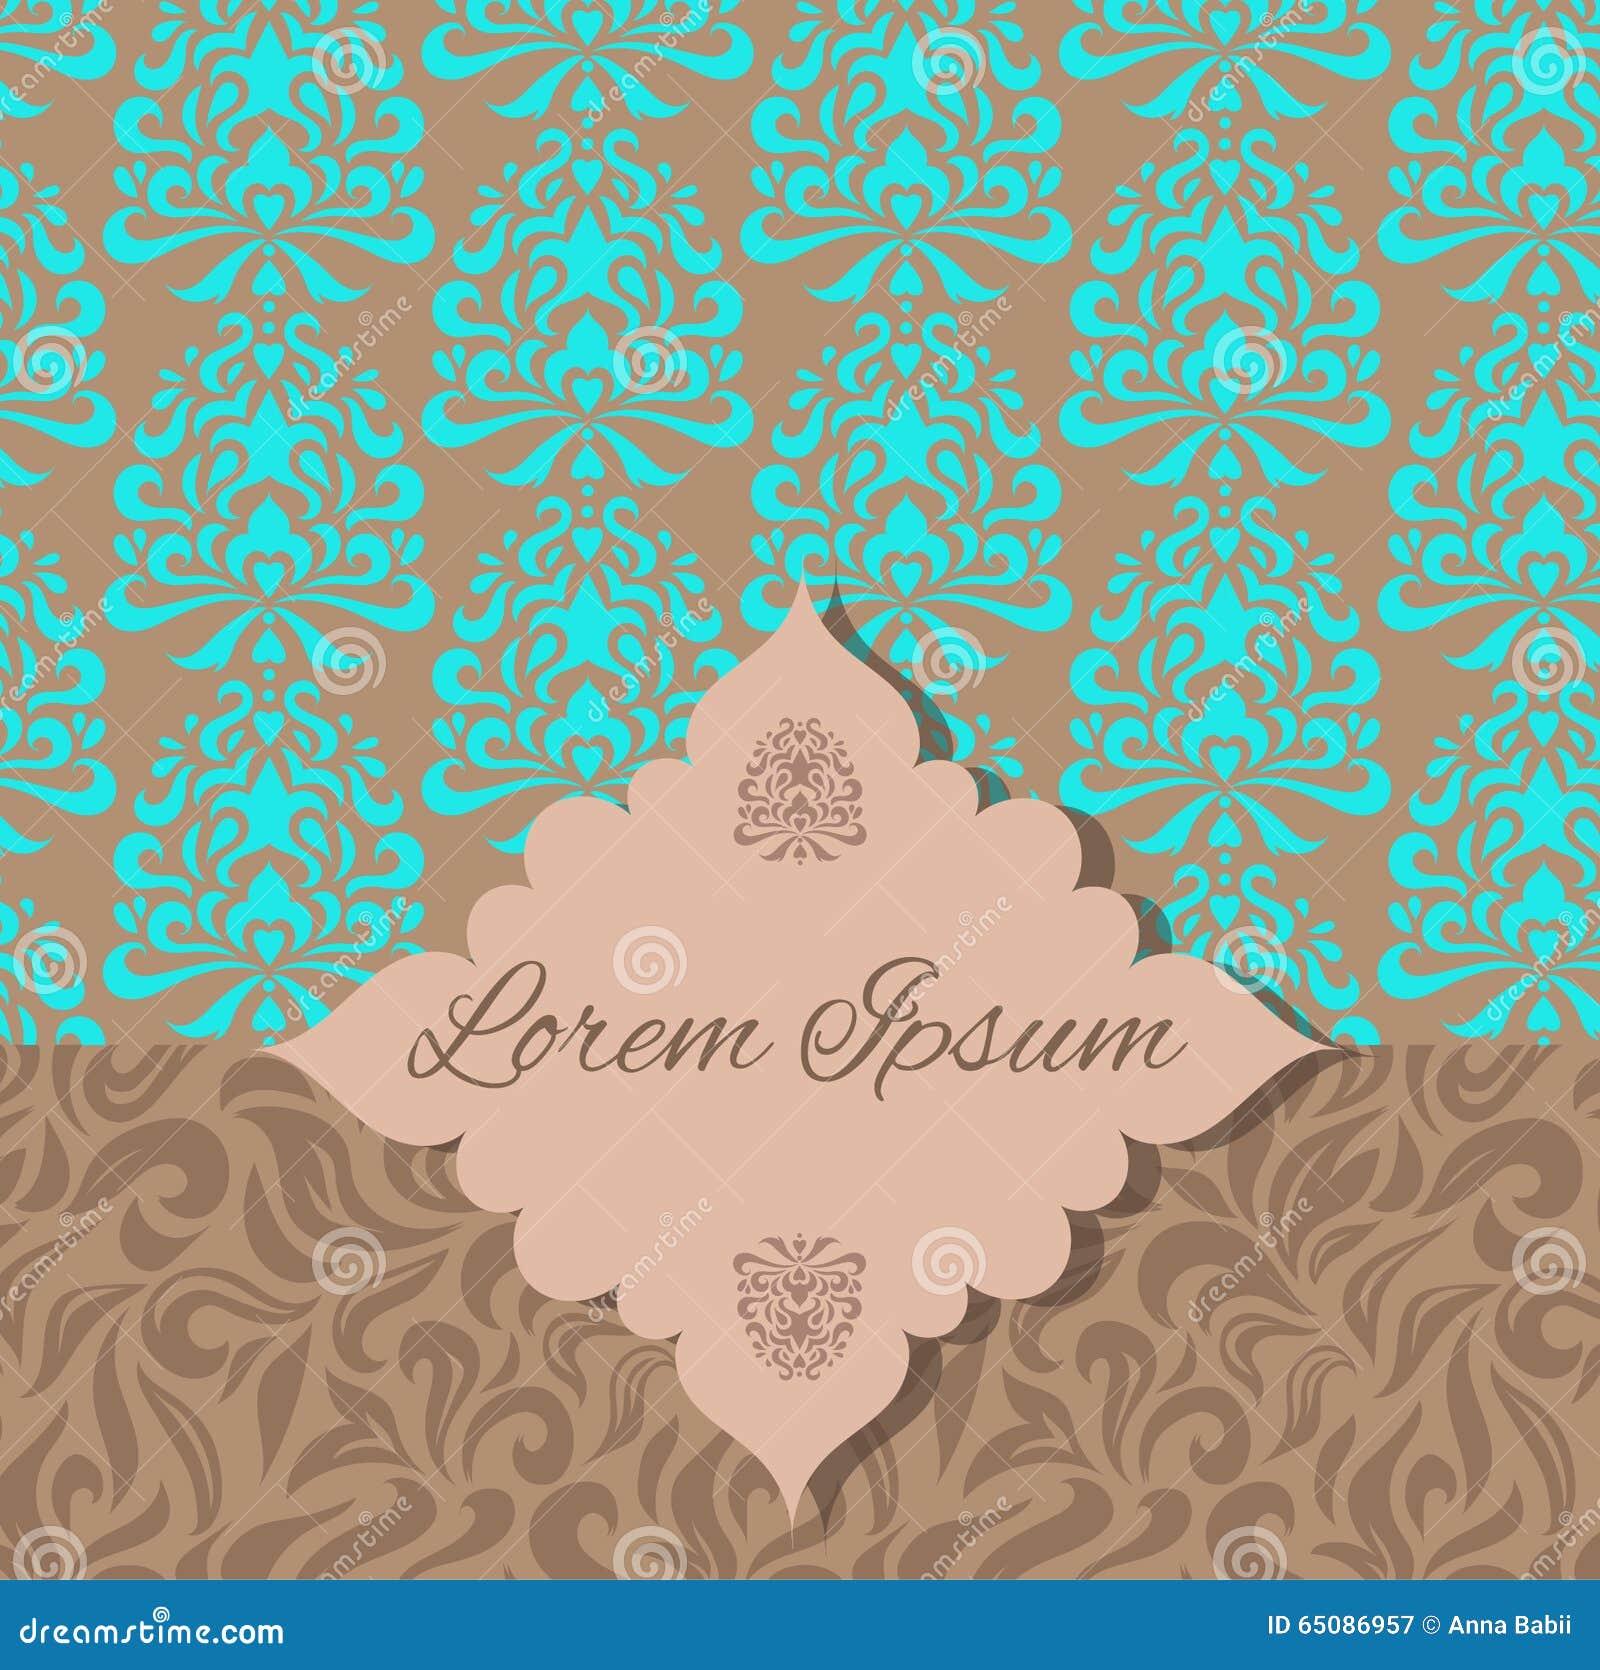 brown blue damask pattern invitation stock vector illustration of